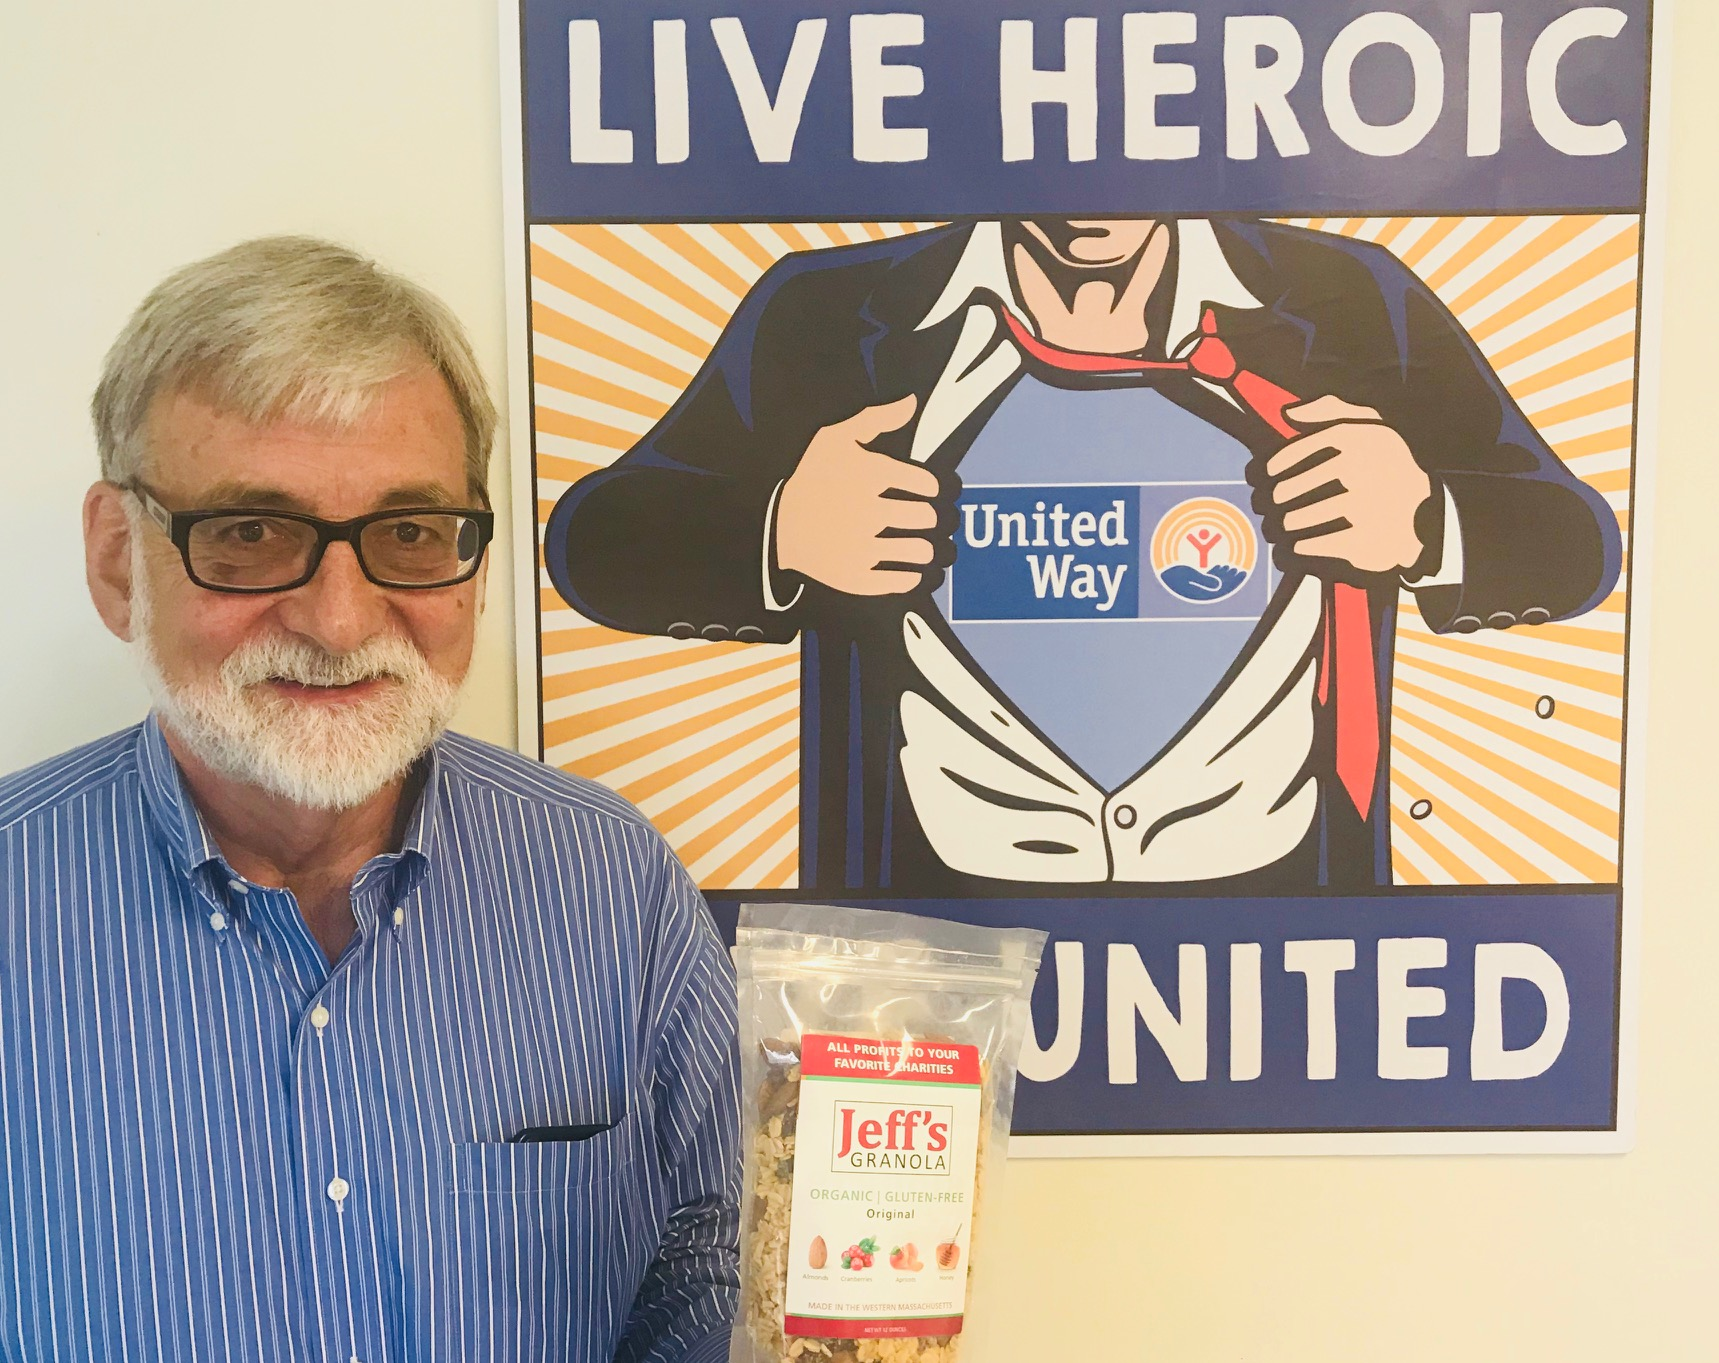 Jeff Greim, founder of Jeff's Granola.